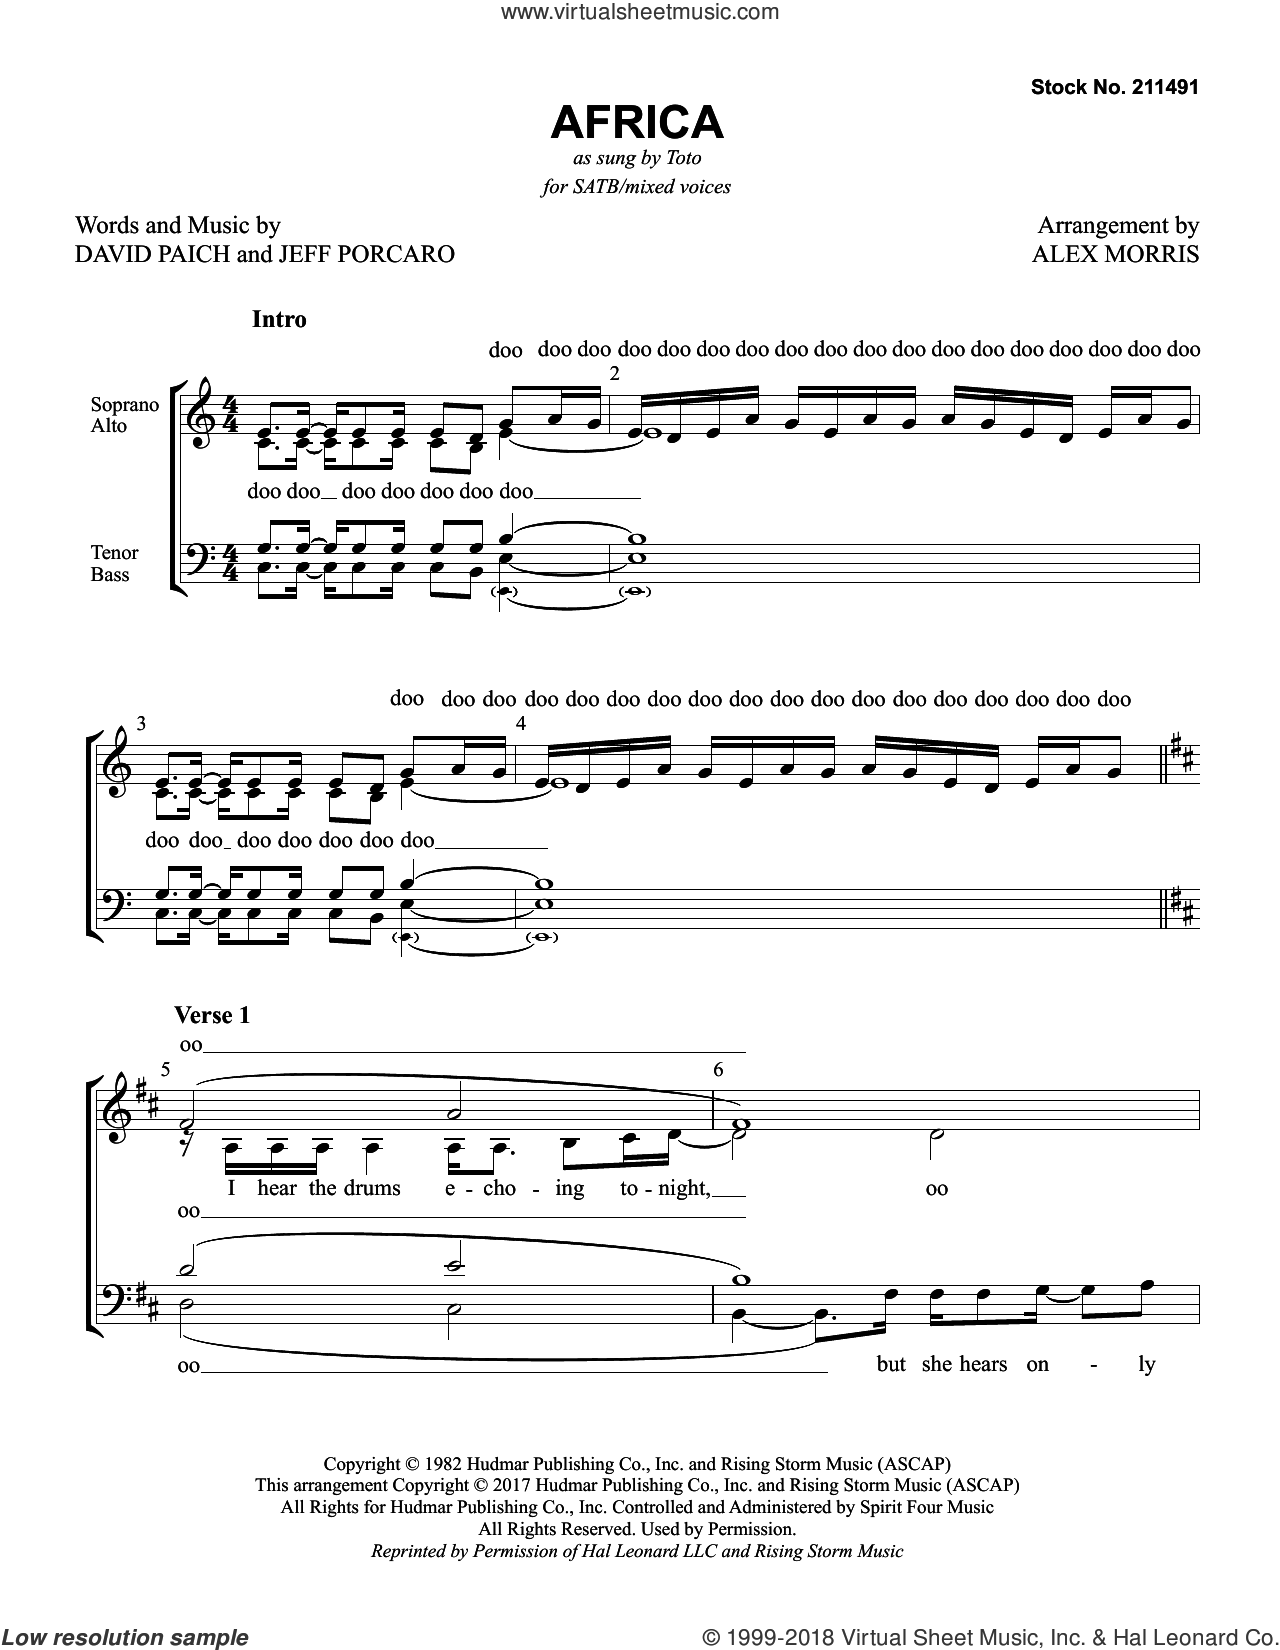 Africa (arr. Alex Morris) sheet music for choir (SATB: soprano, alto, tenor, bass) by Toto, Alex Morris, David Paich and Jeff Porcaro, intermediate skill level